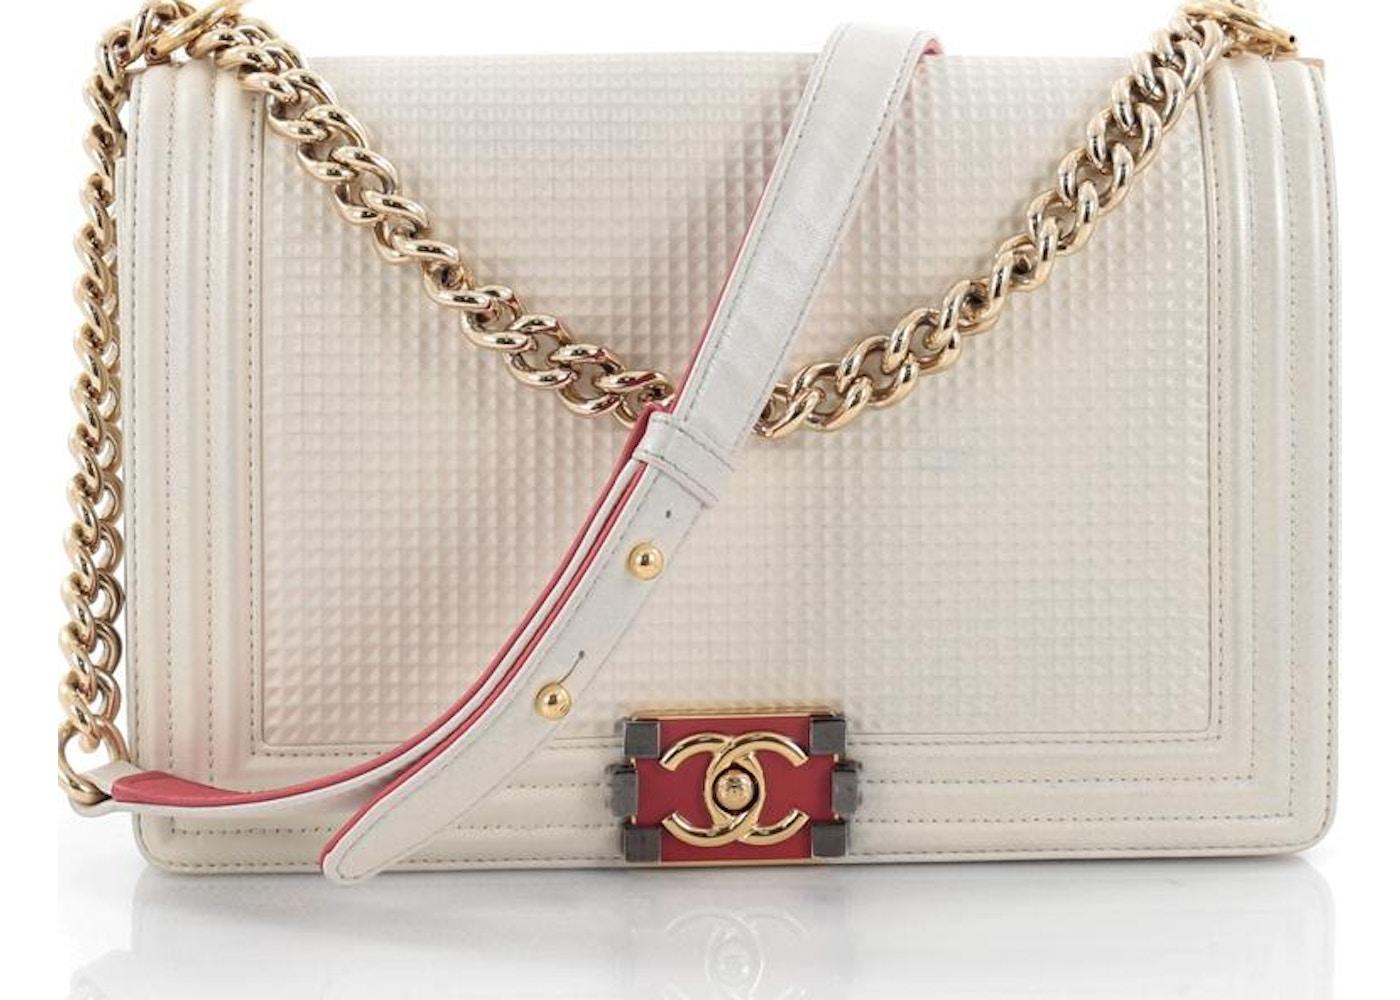 1d21c9808cea Chanel Boy Flap Bag Cube Embossed New Medium Off White